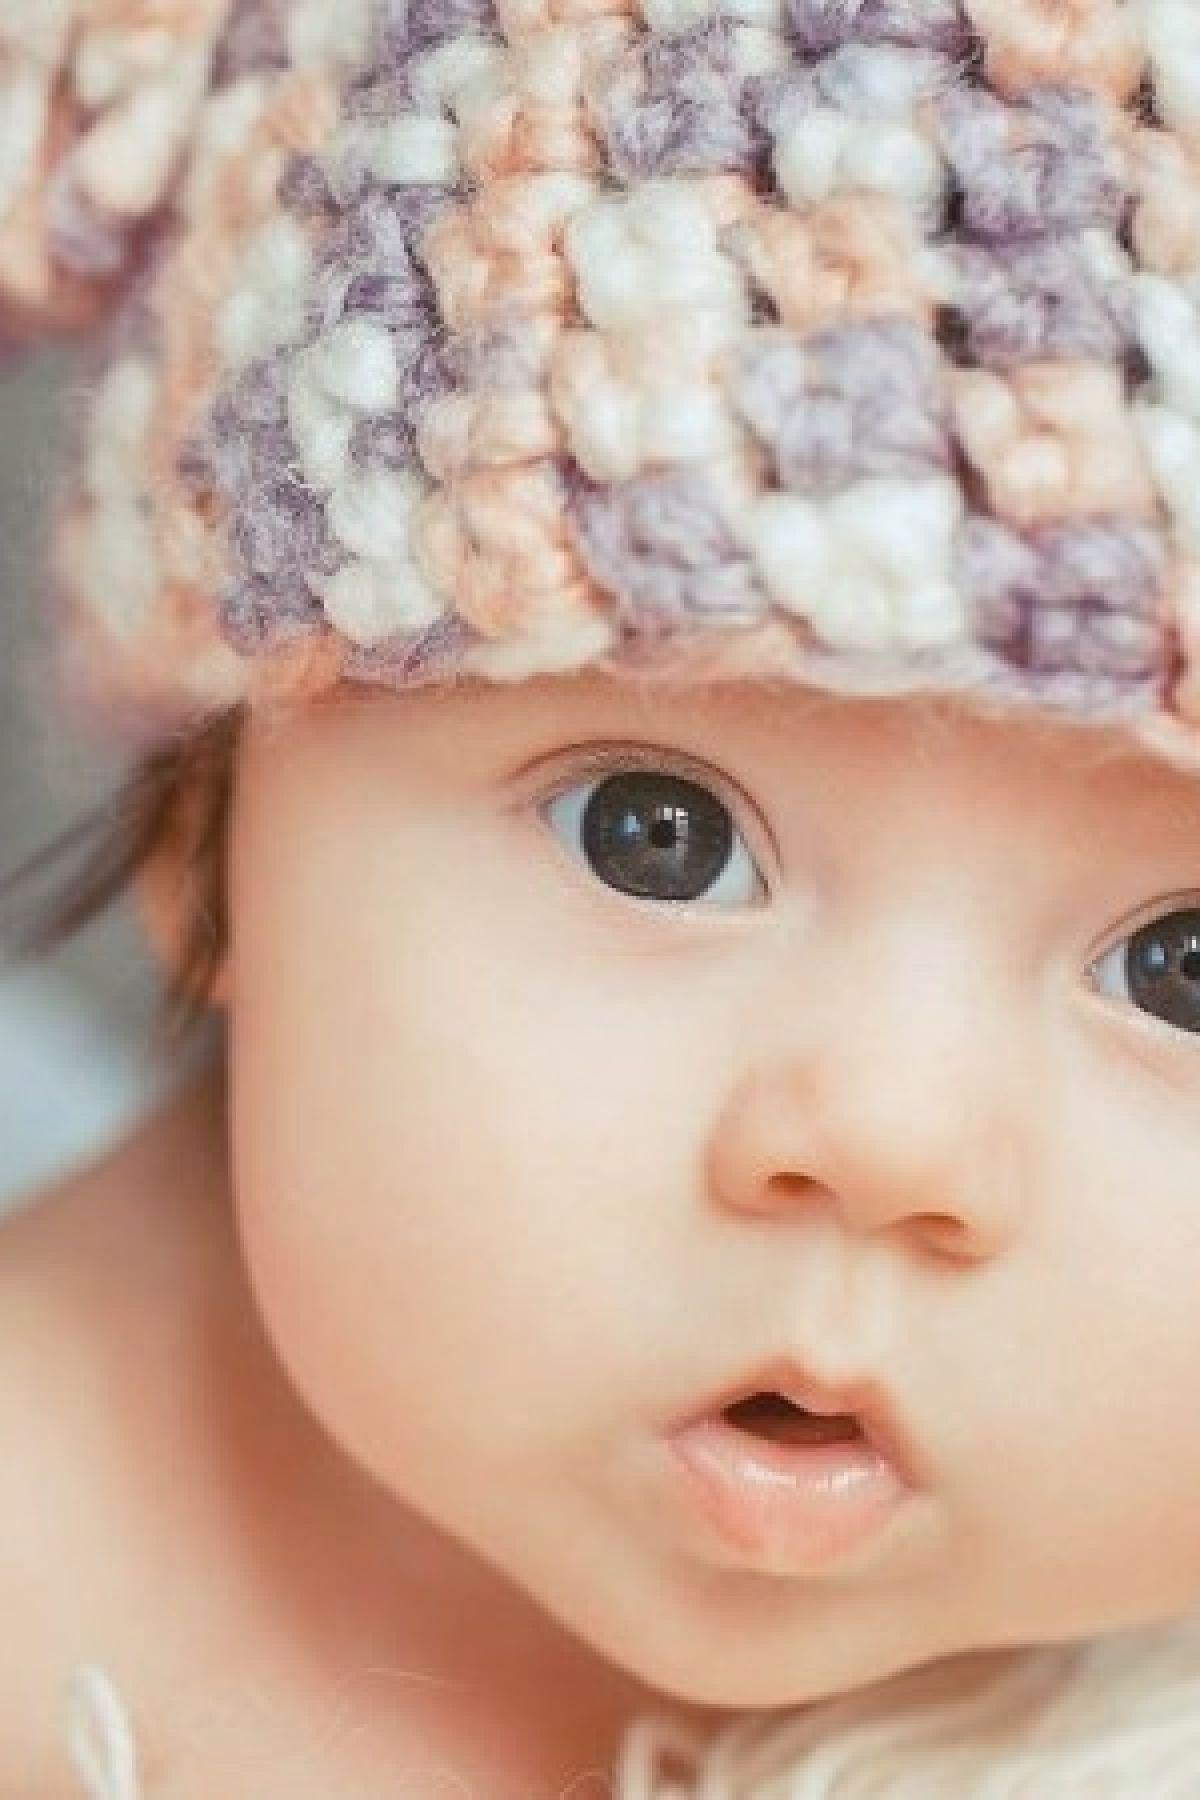 Gubitak telesne težine u prvim danima bebe